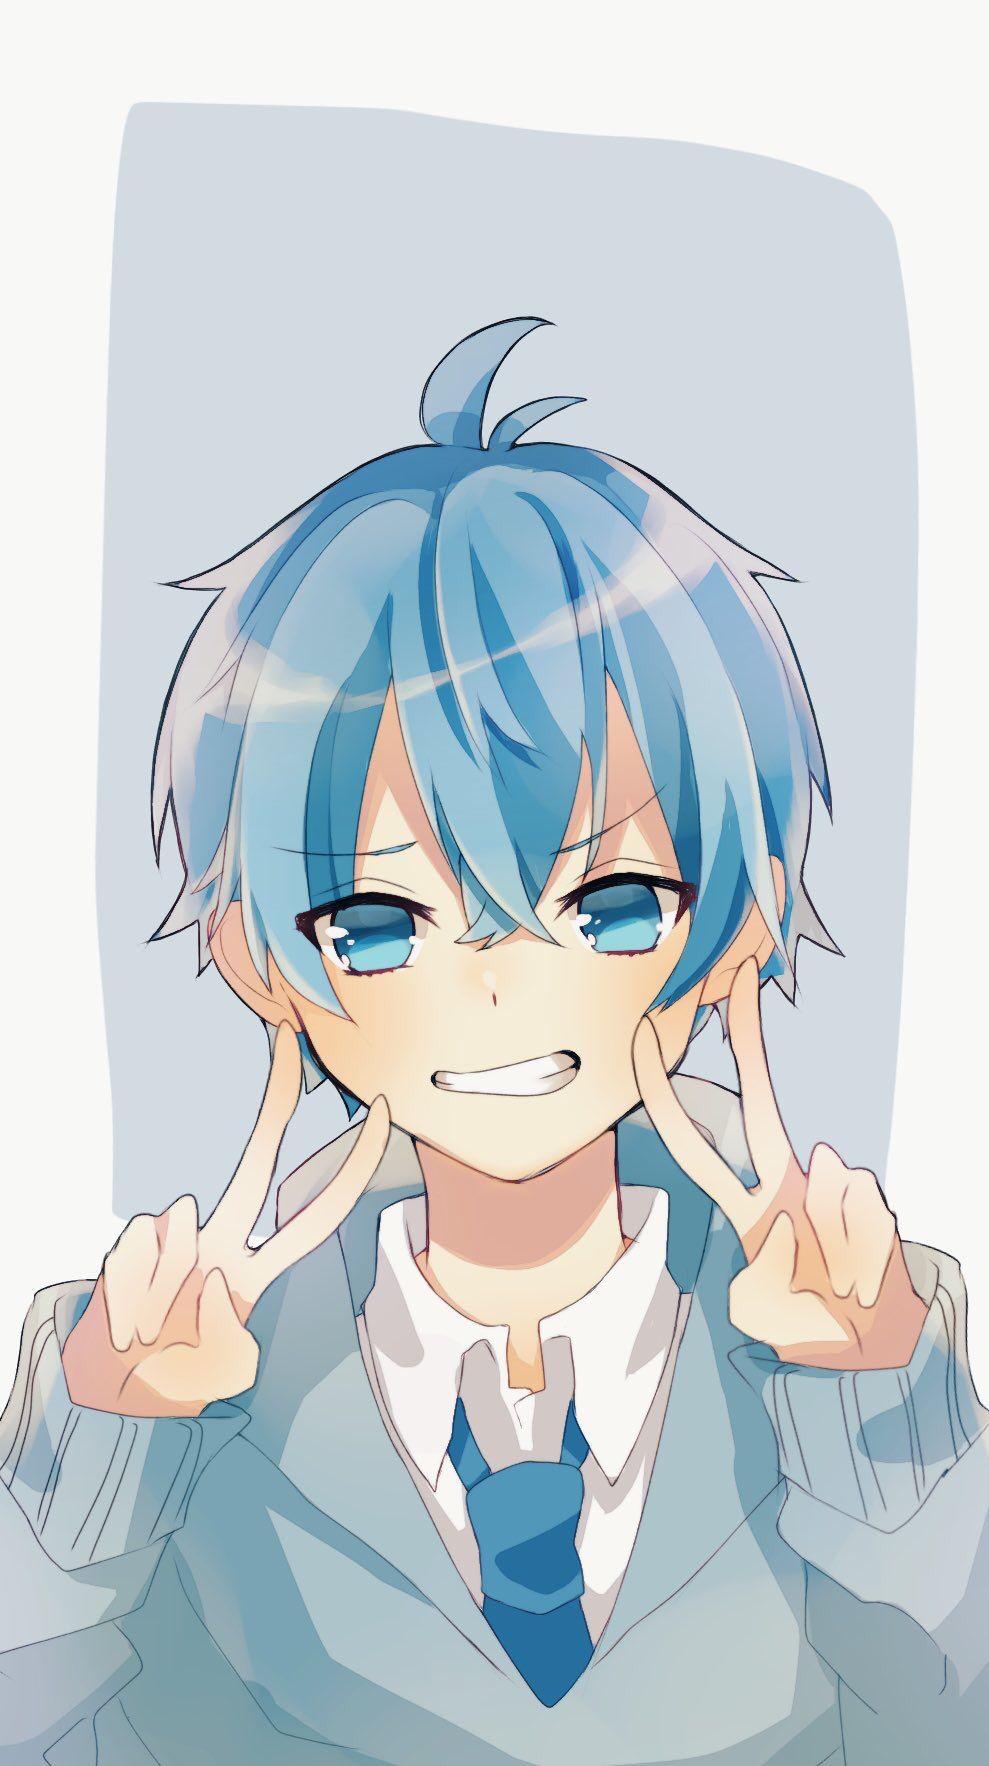 Pin By Idich On Animeforlife Anime Child Cute Anime Guys Blue Anime